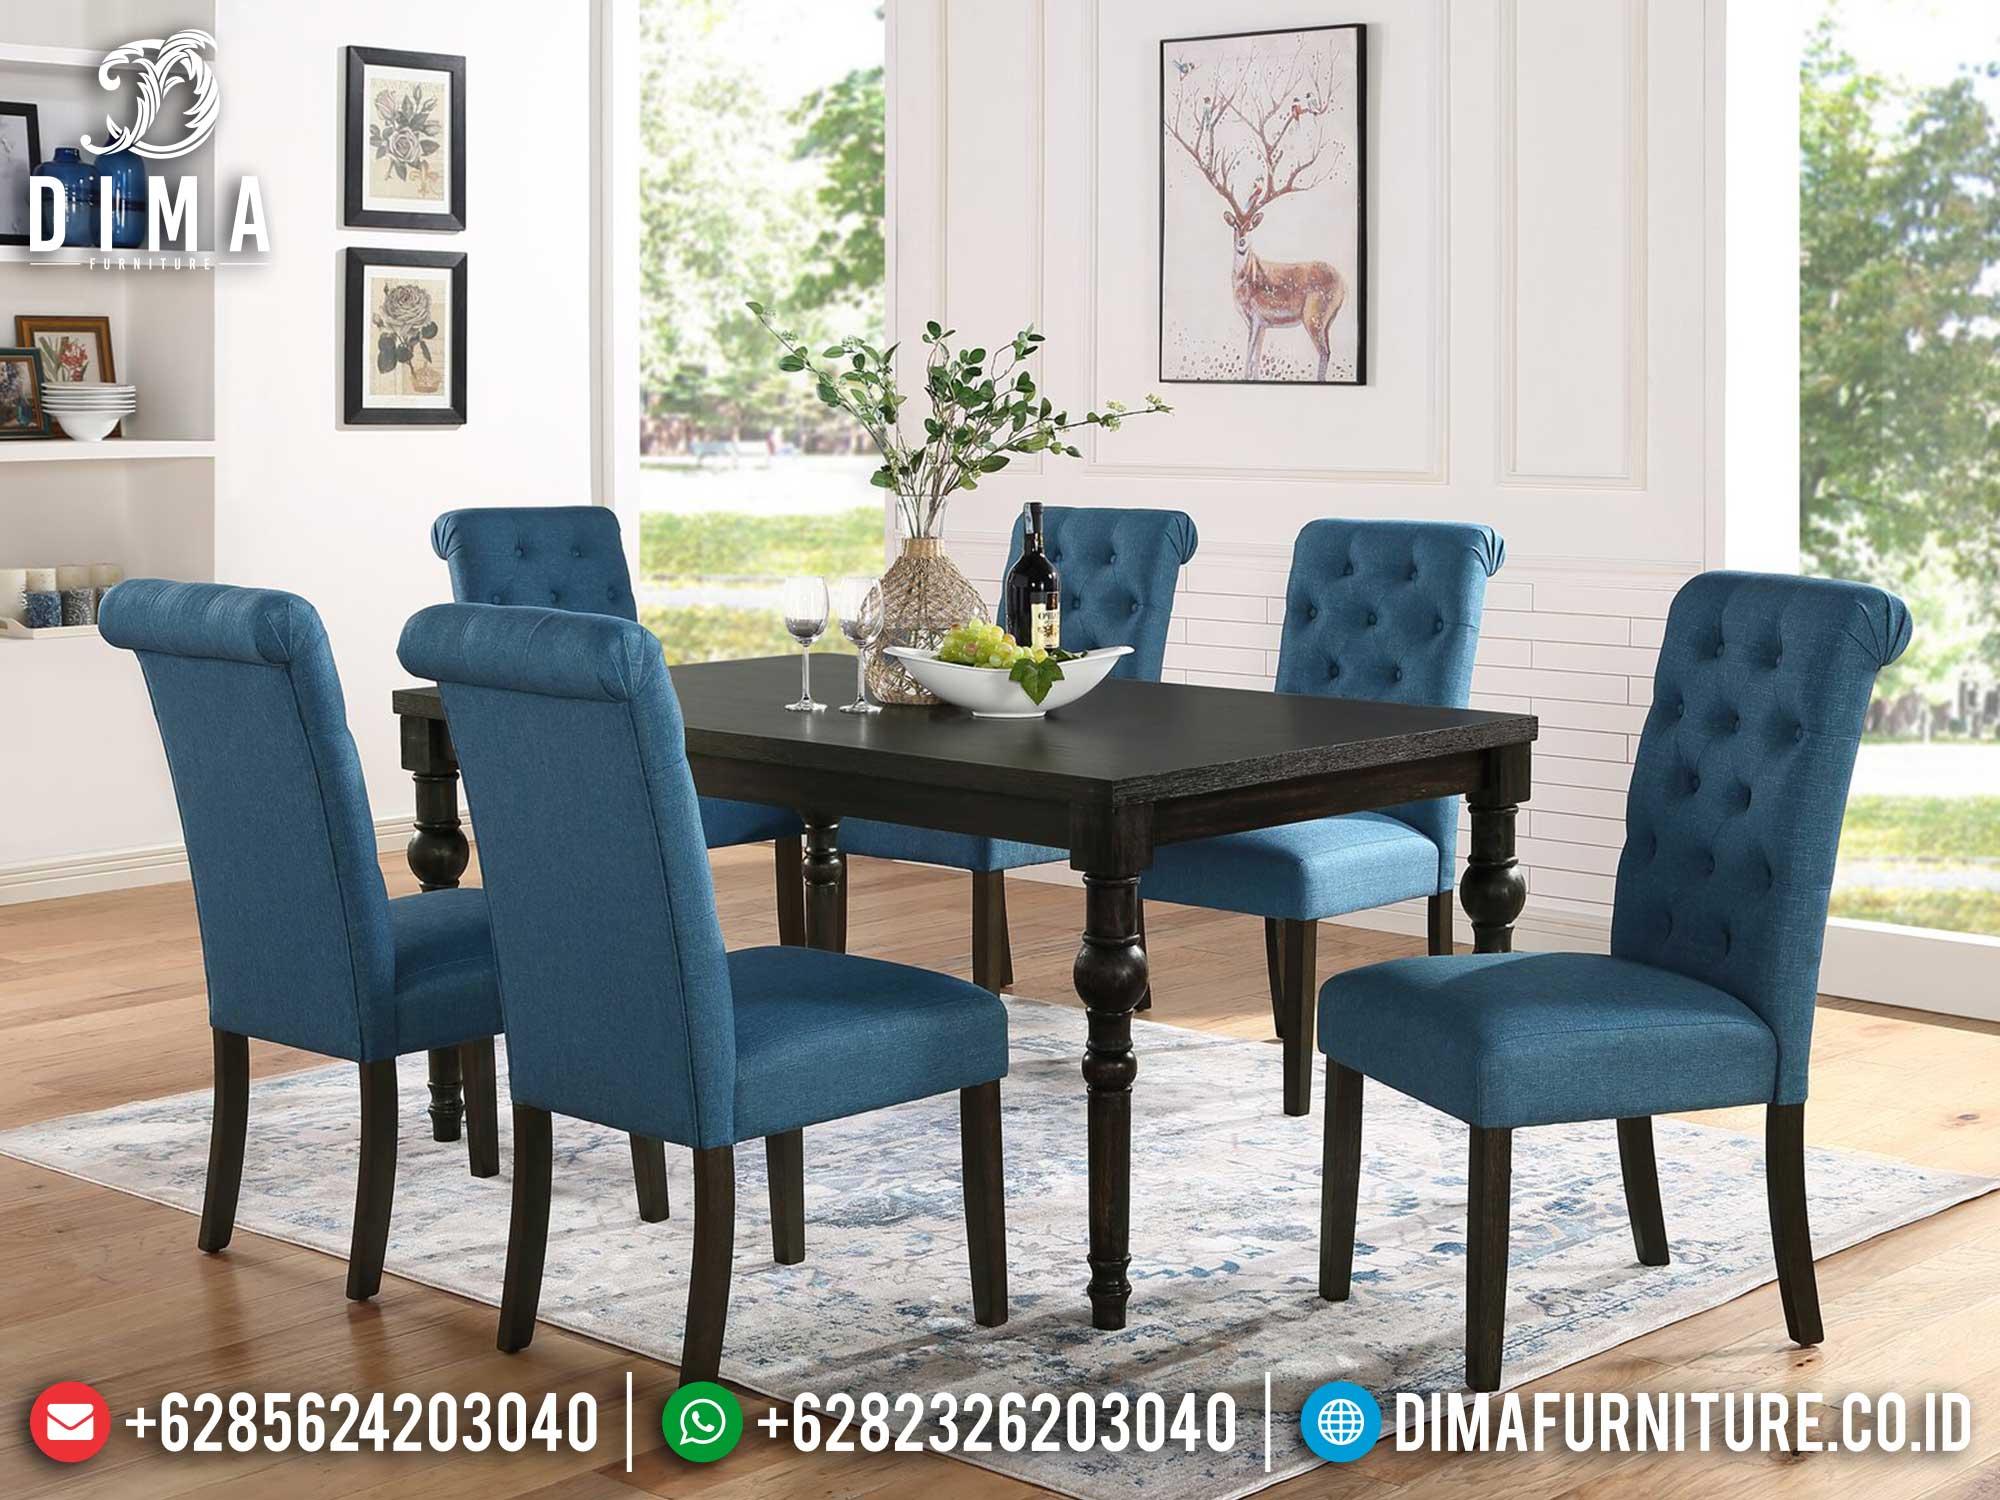 Meja Makan Minimalis Terbaru Simple Design Best Collection Update ST-1237